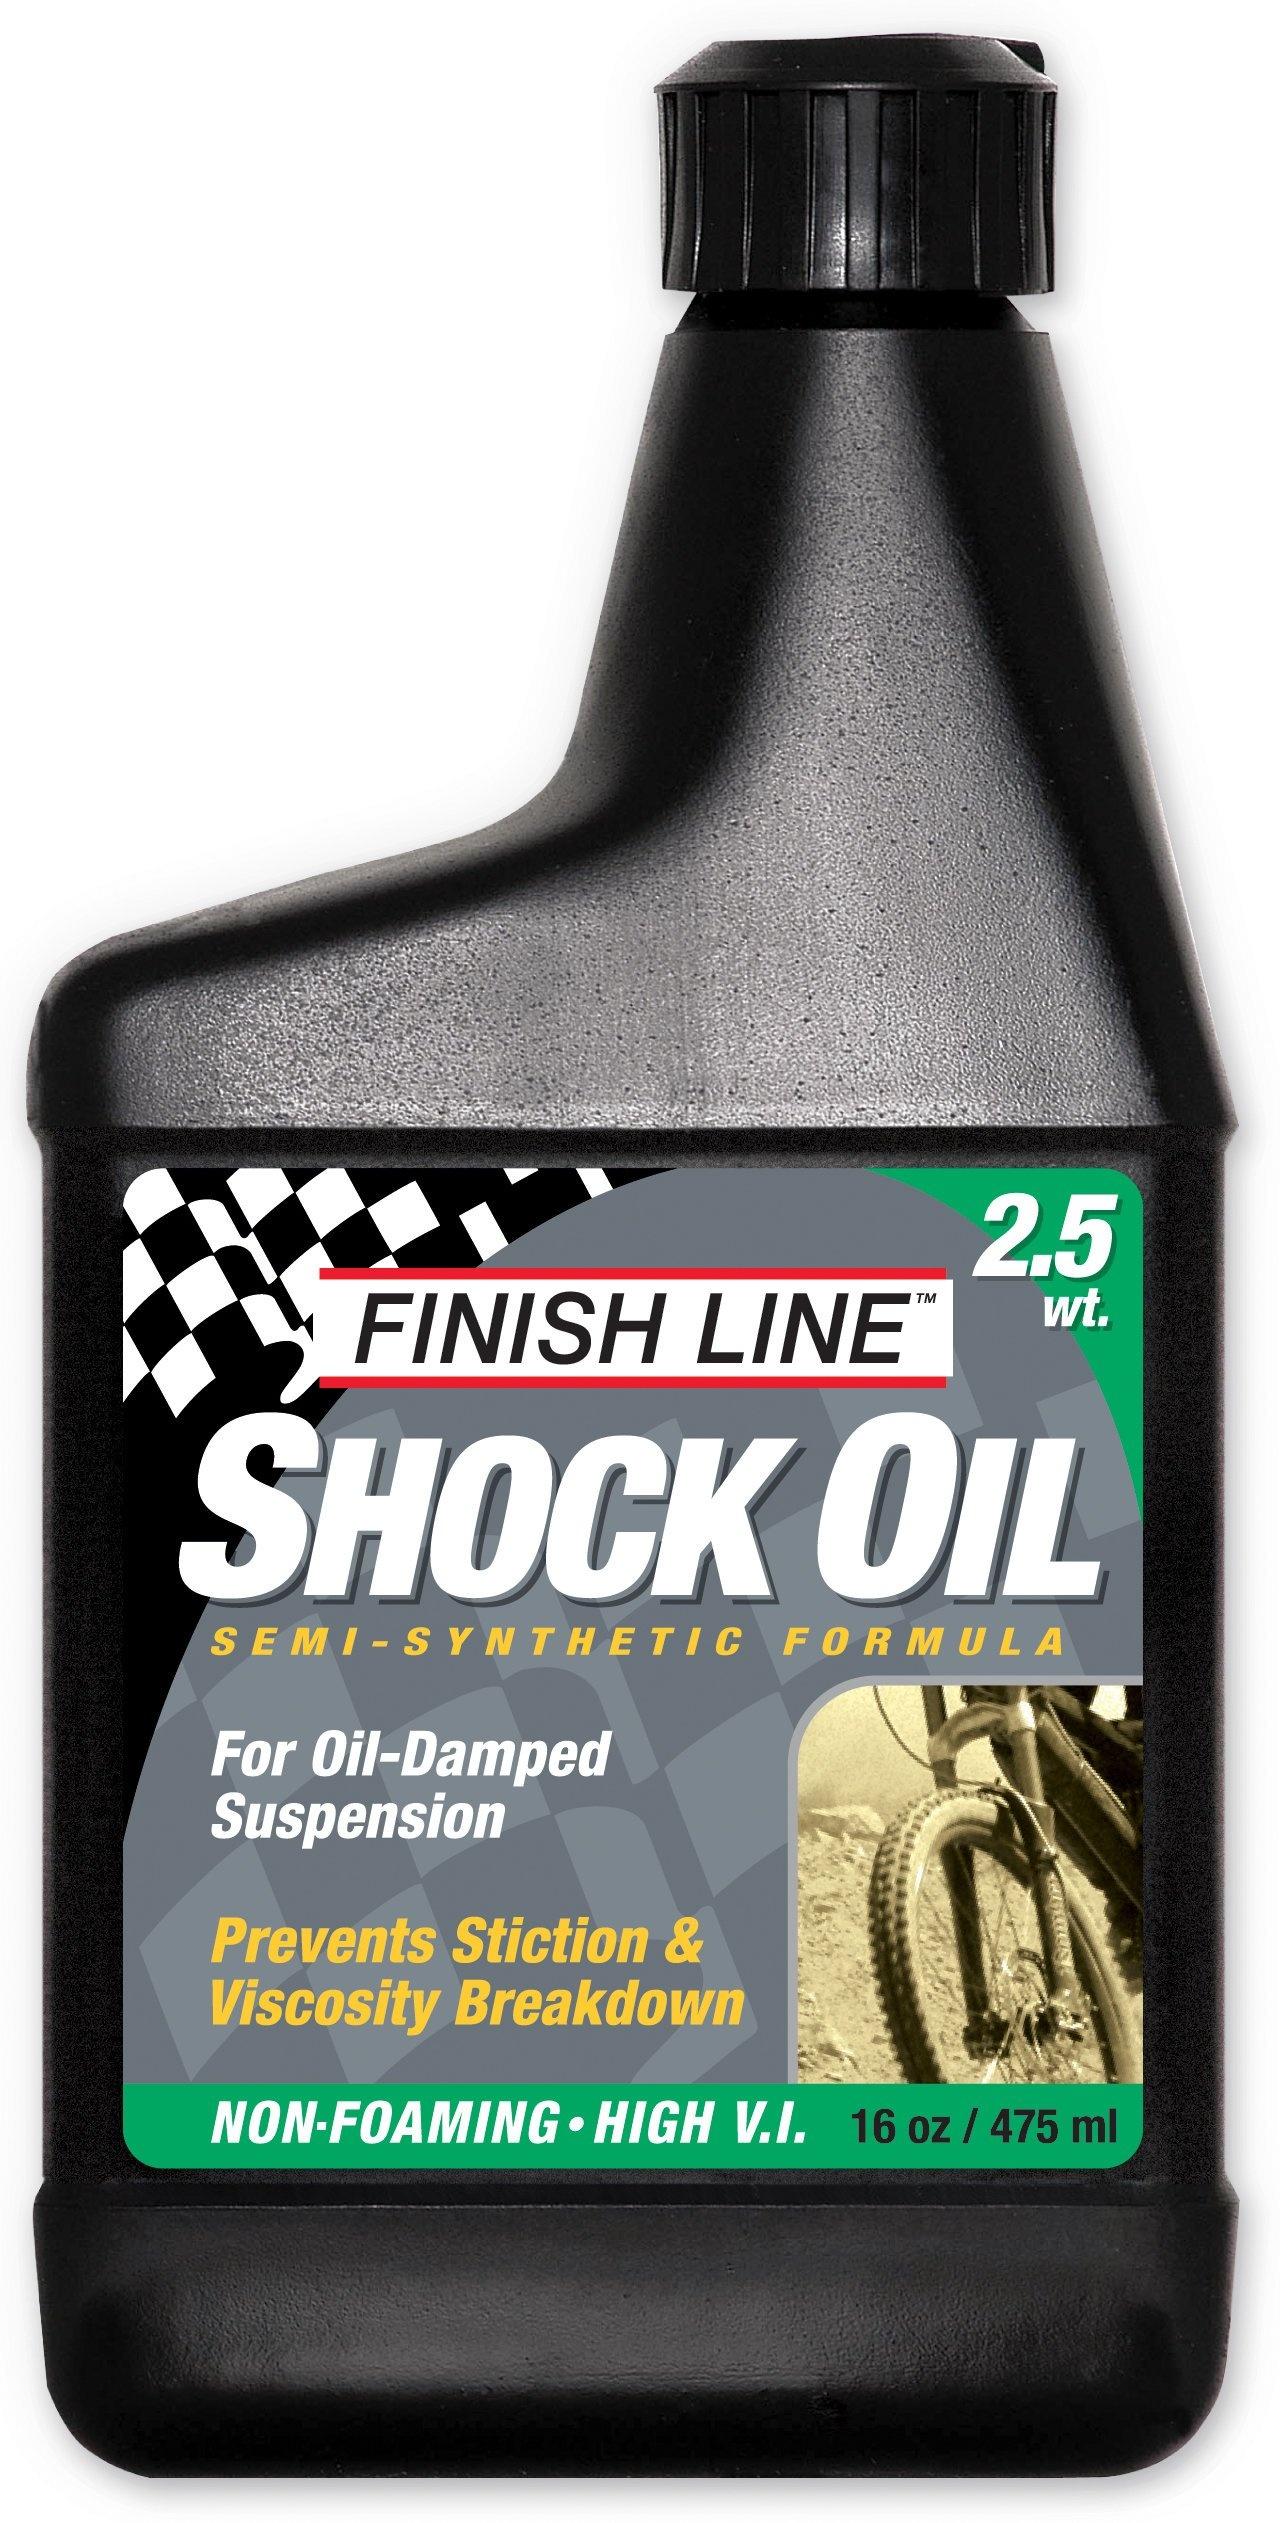 Finish Line Shock Oil Forgaffelolie 2.5wt